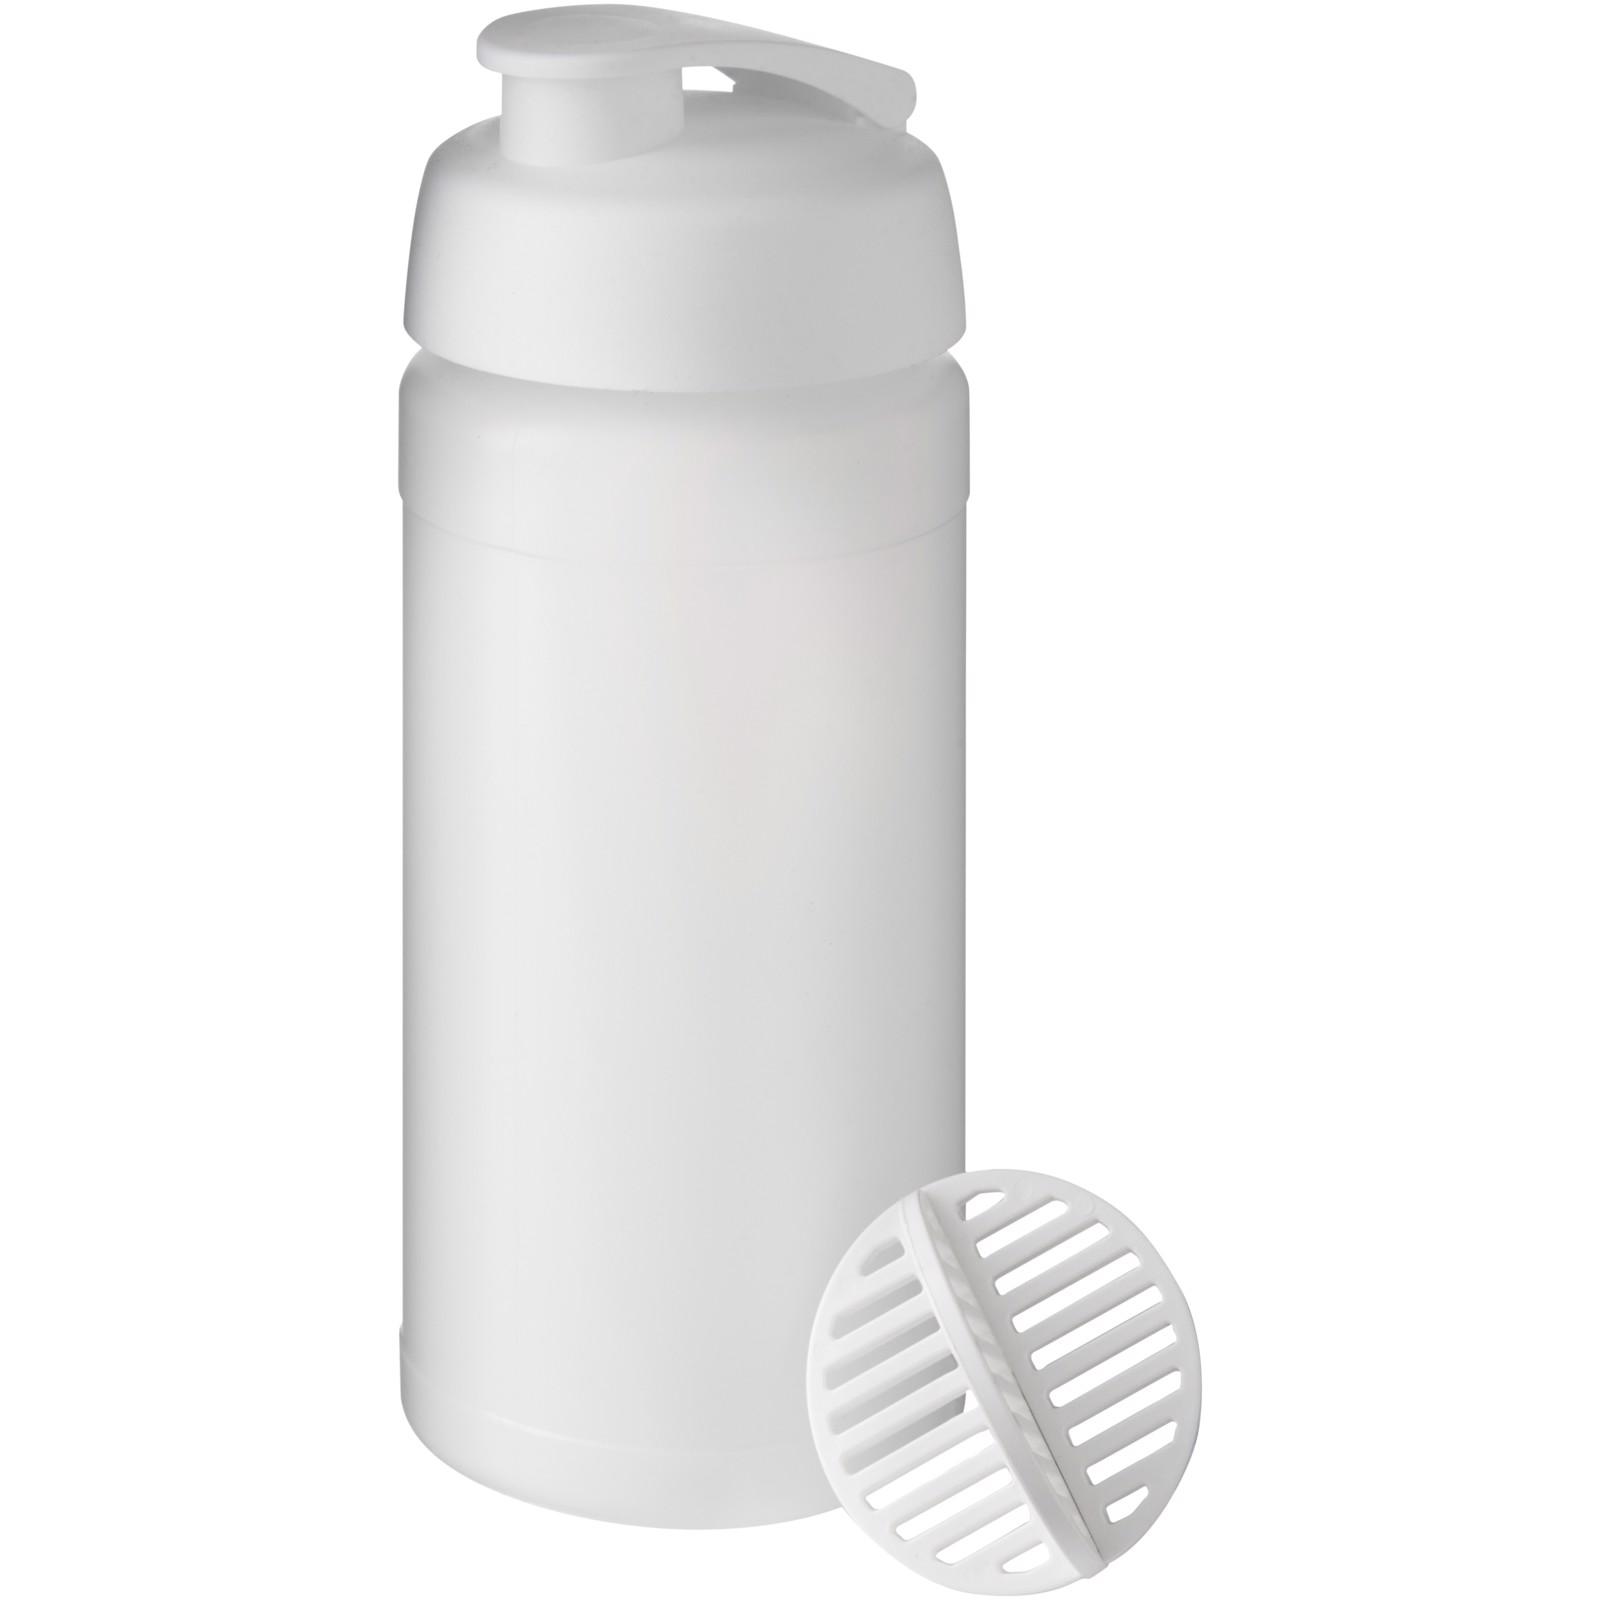 Baseline Plus 500 ml shaker bottle - White / Frosted clear